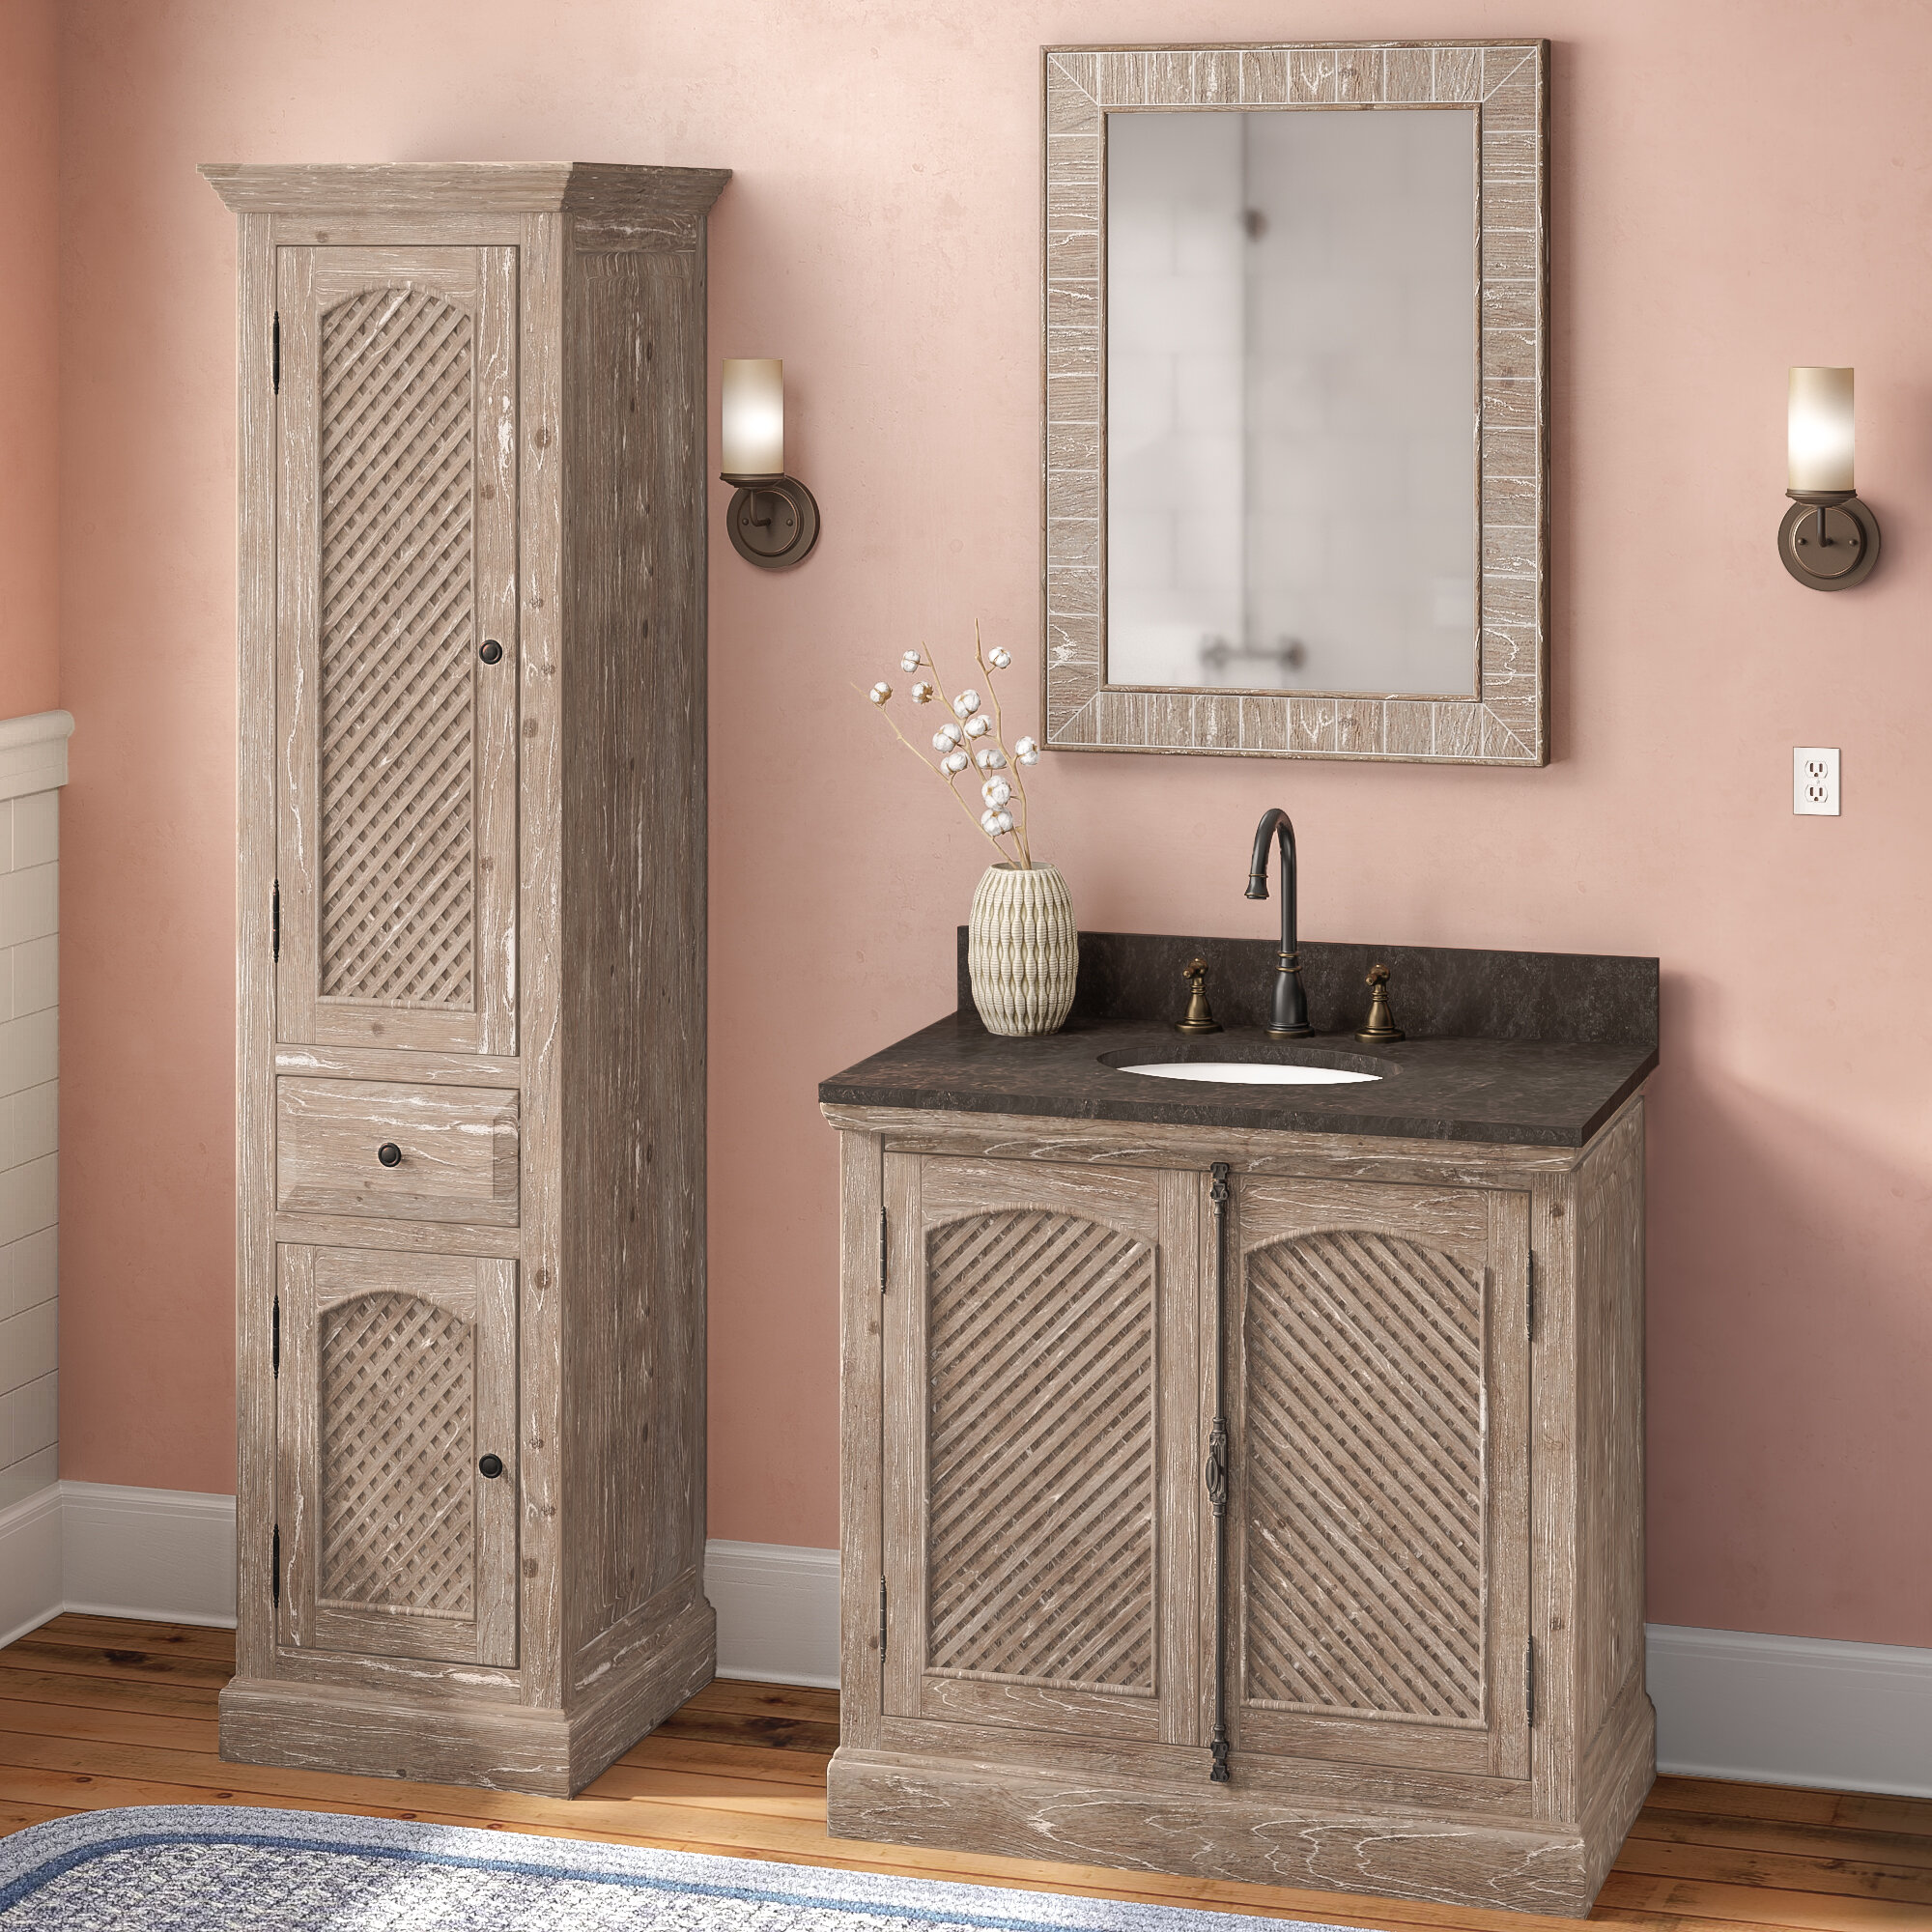 Laurel Foundry Modern Farmhouse Clemmie 37 Single Bathroom Vanity